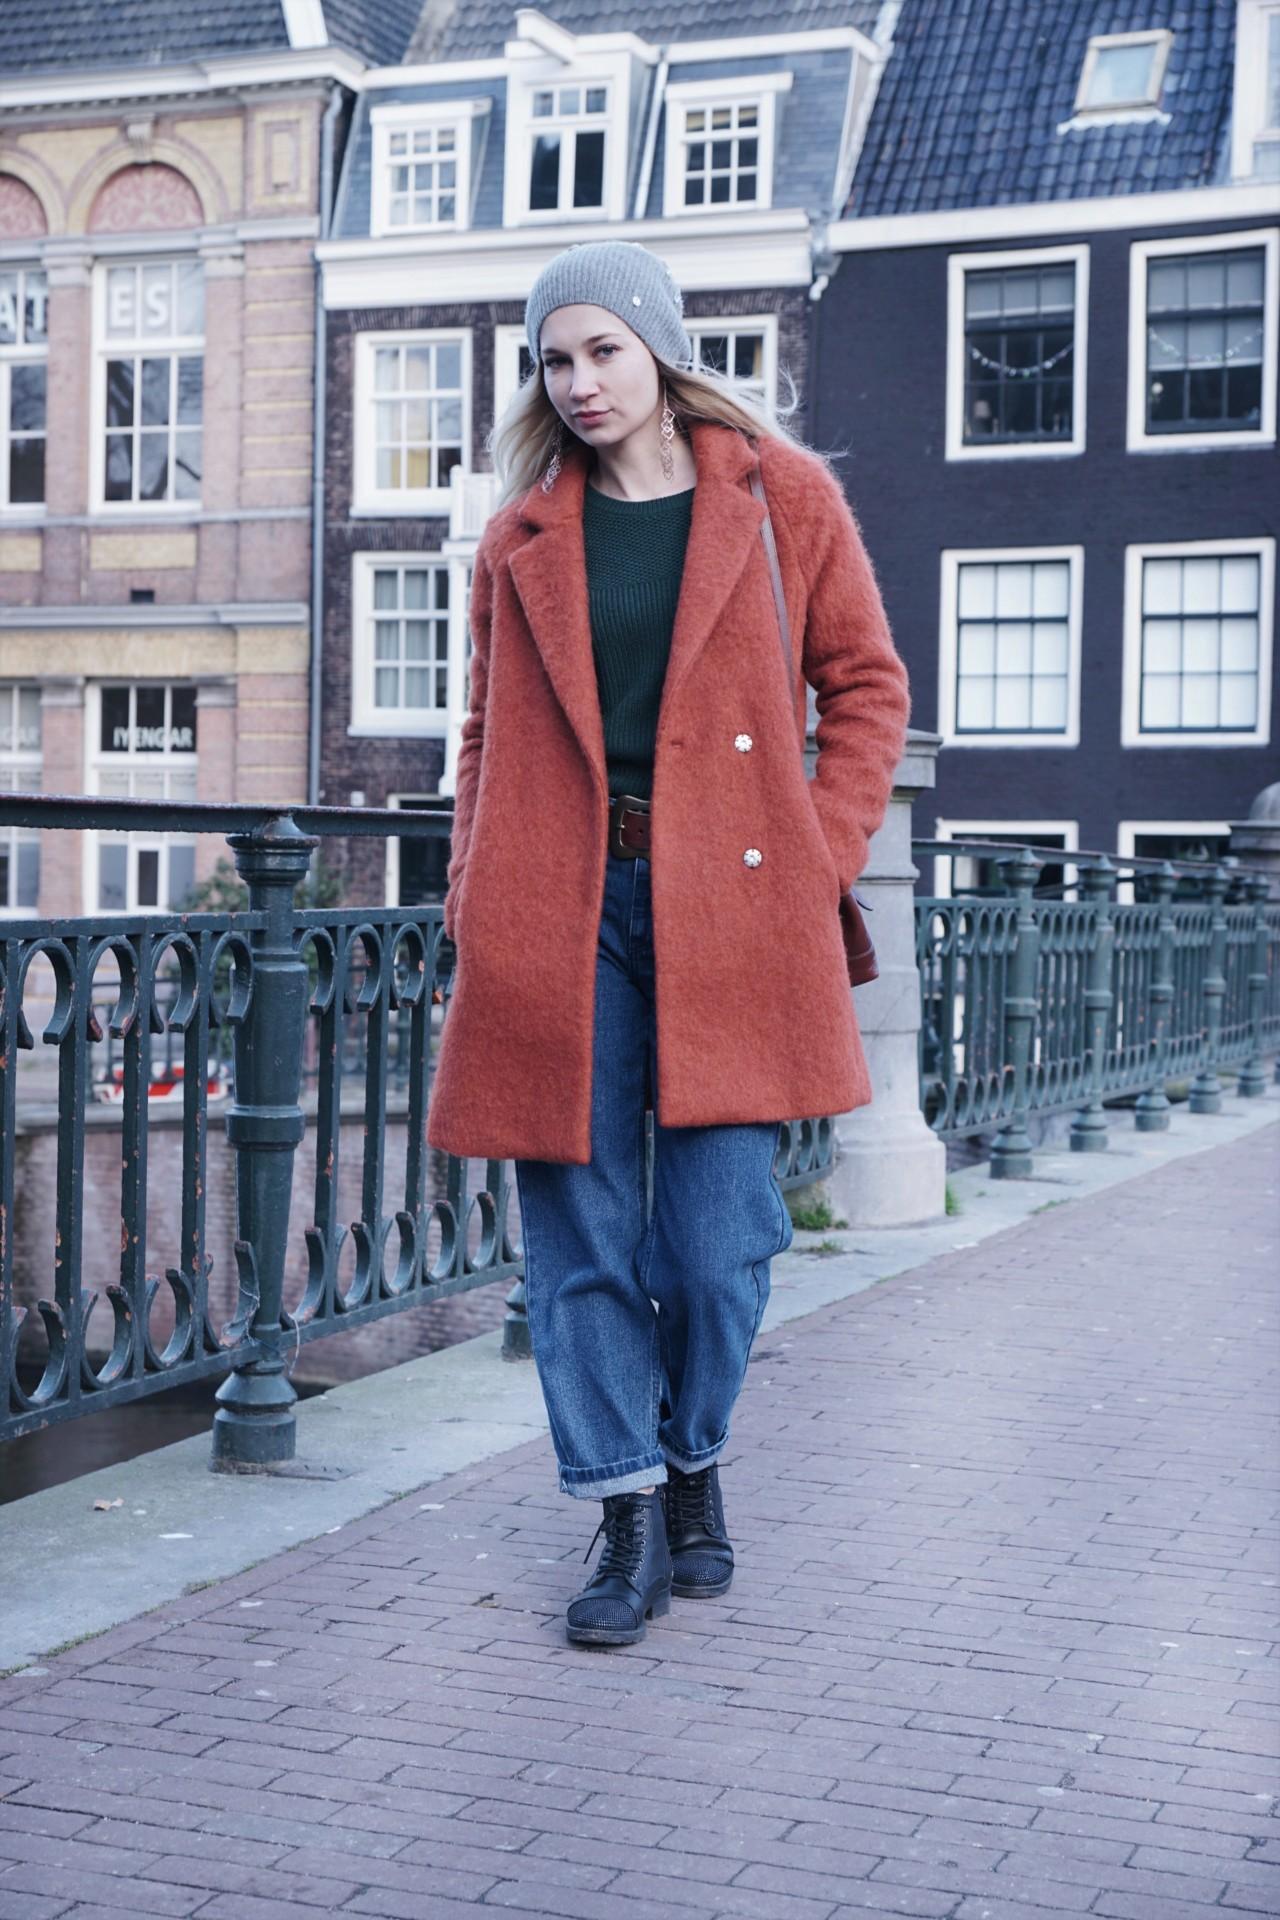 dbkstylez_envii_amsterdam_streetstyle_topblog